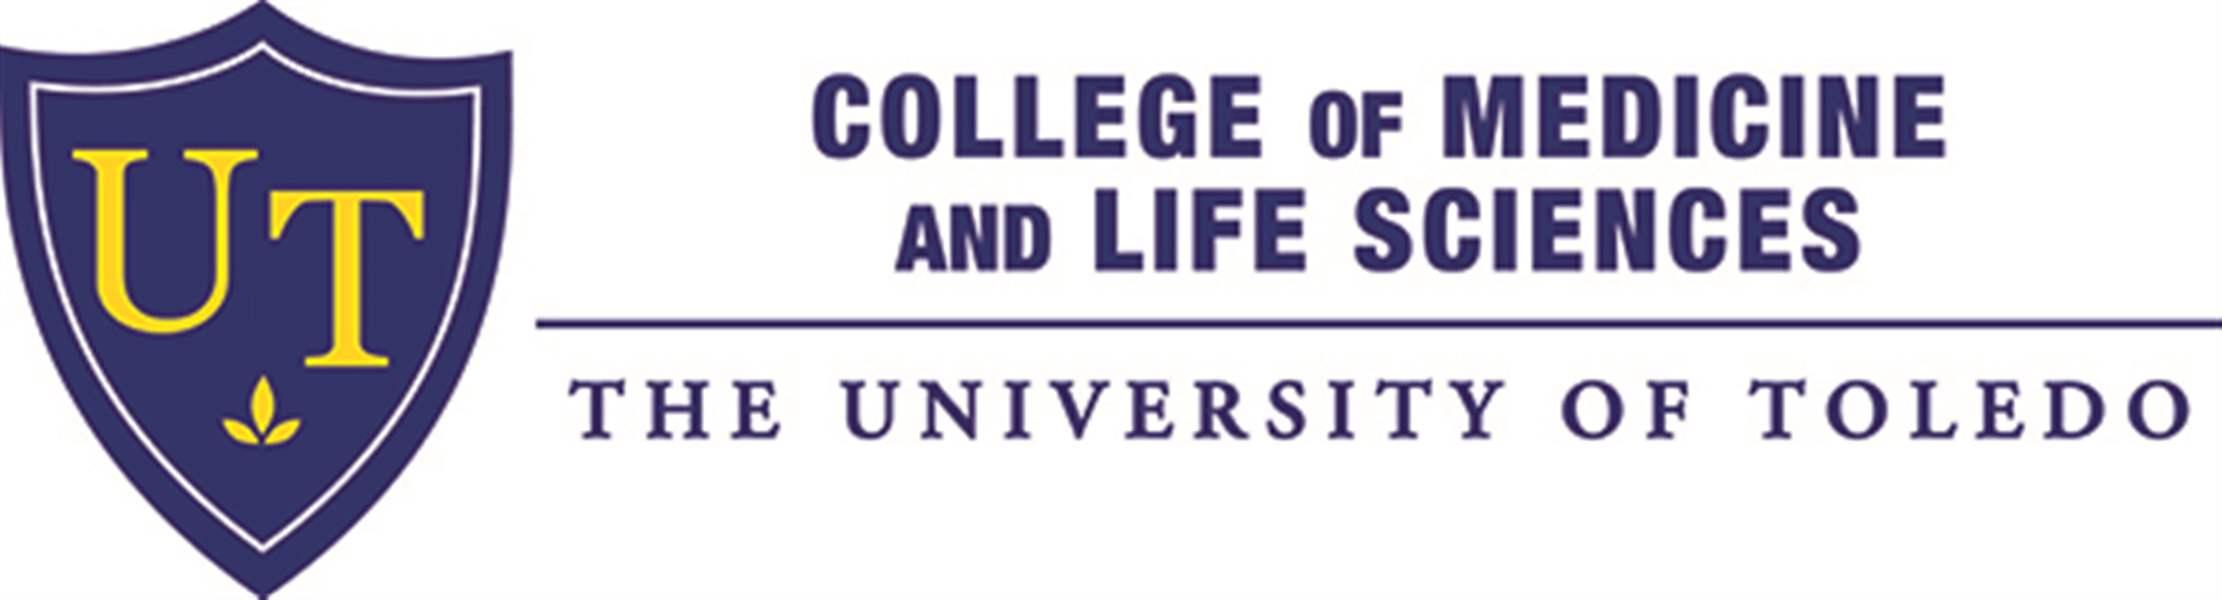 The University of Toledo College of Medicine Secondary Essays